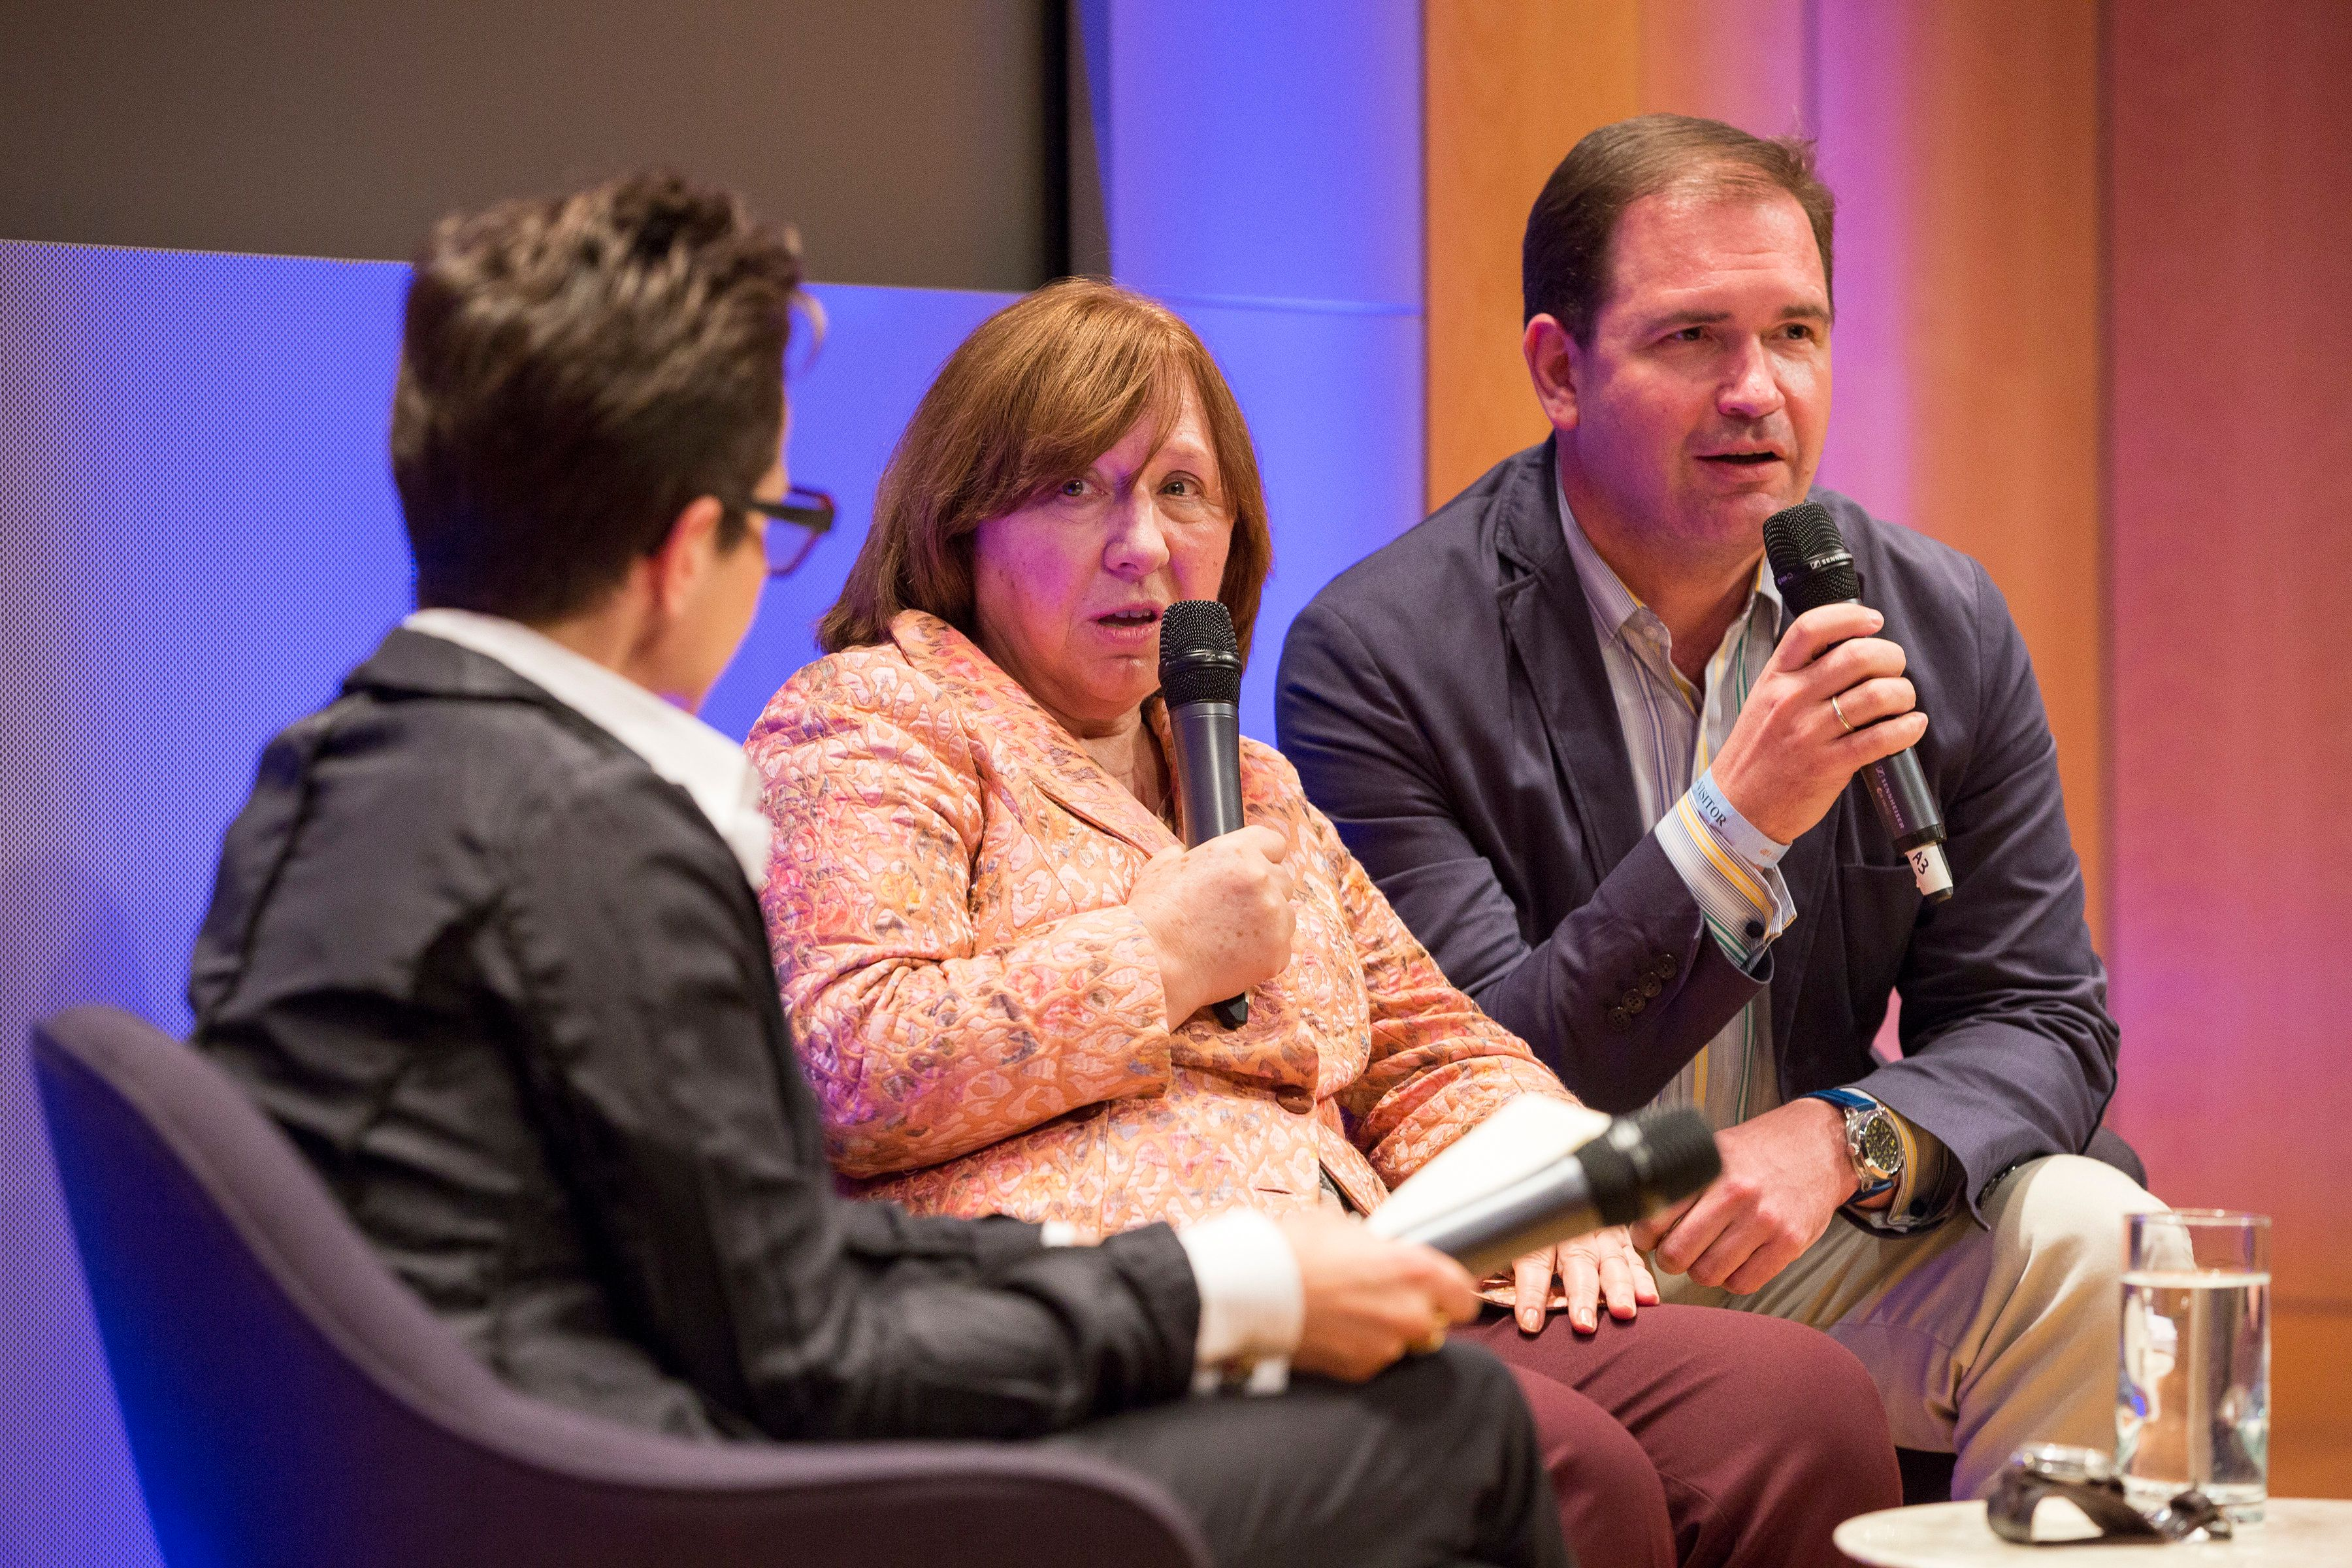 Translator Anatoli Samochornov right  translates at a New York Public Library Event with Masha Gessen and Svetlana Alexievich in 2016